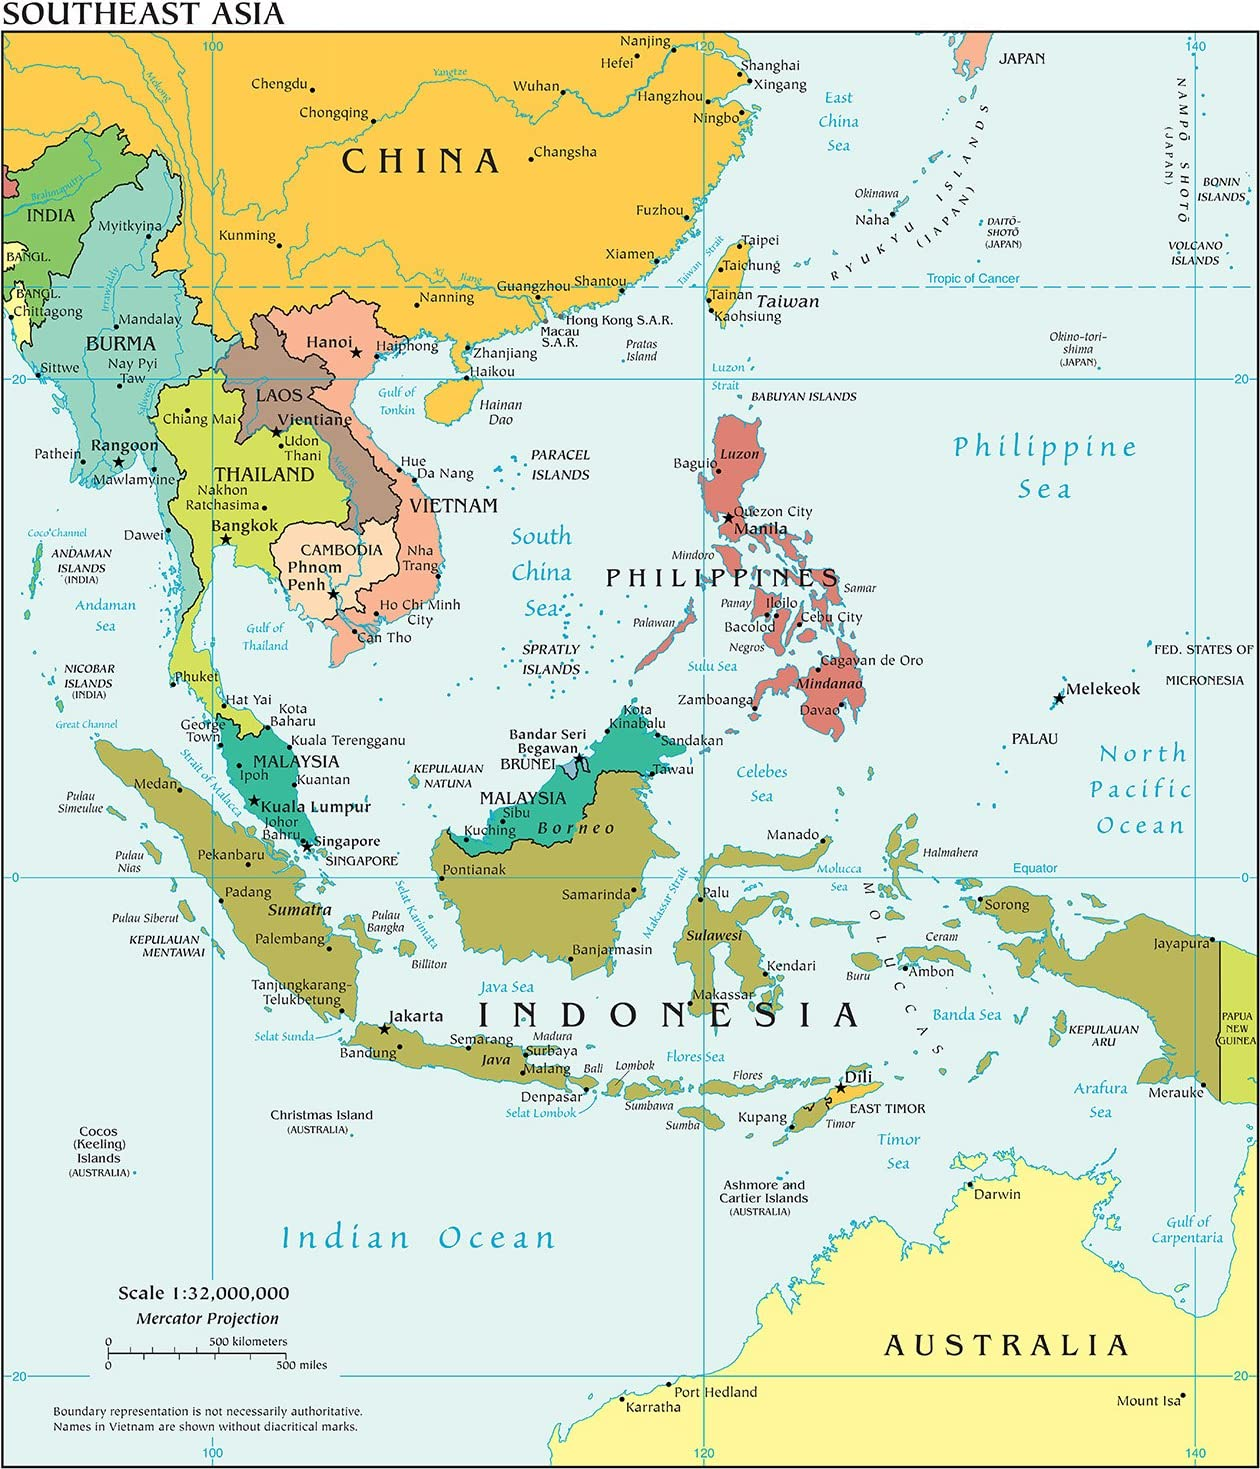 Amazon.com: VintPrint Map Poster - Southeast Asia Political ...